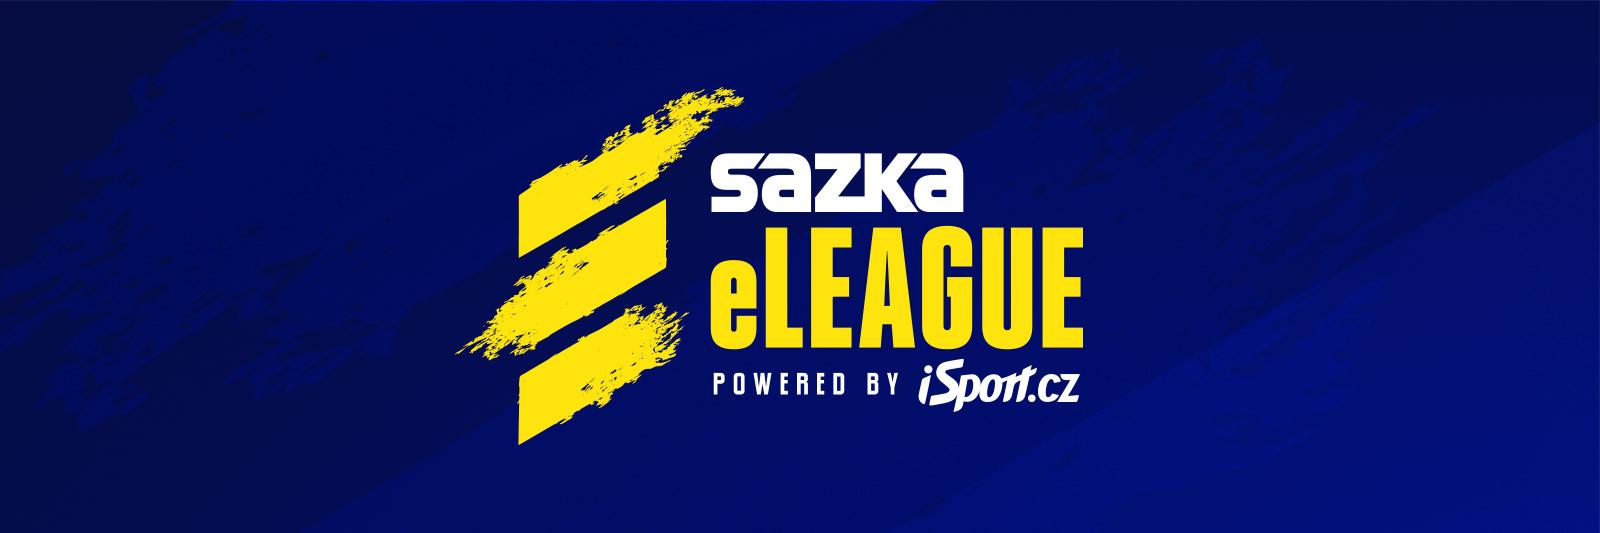 sazka-eleague-cs-go-sezona-2021-i-2-split